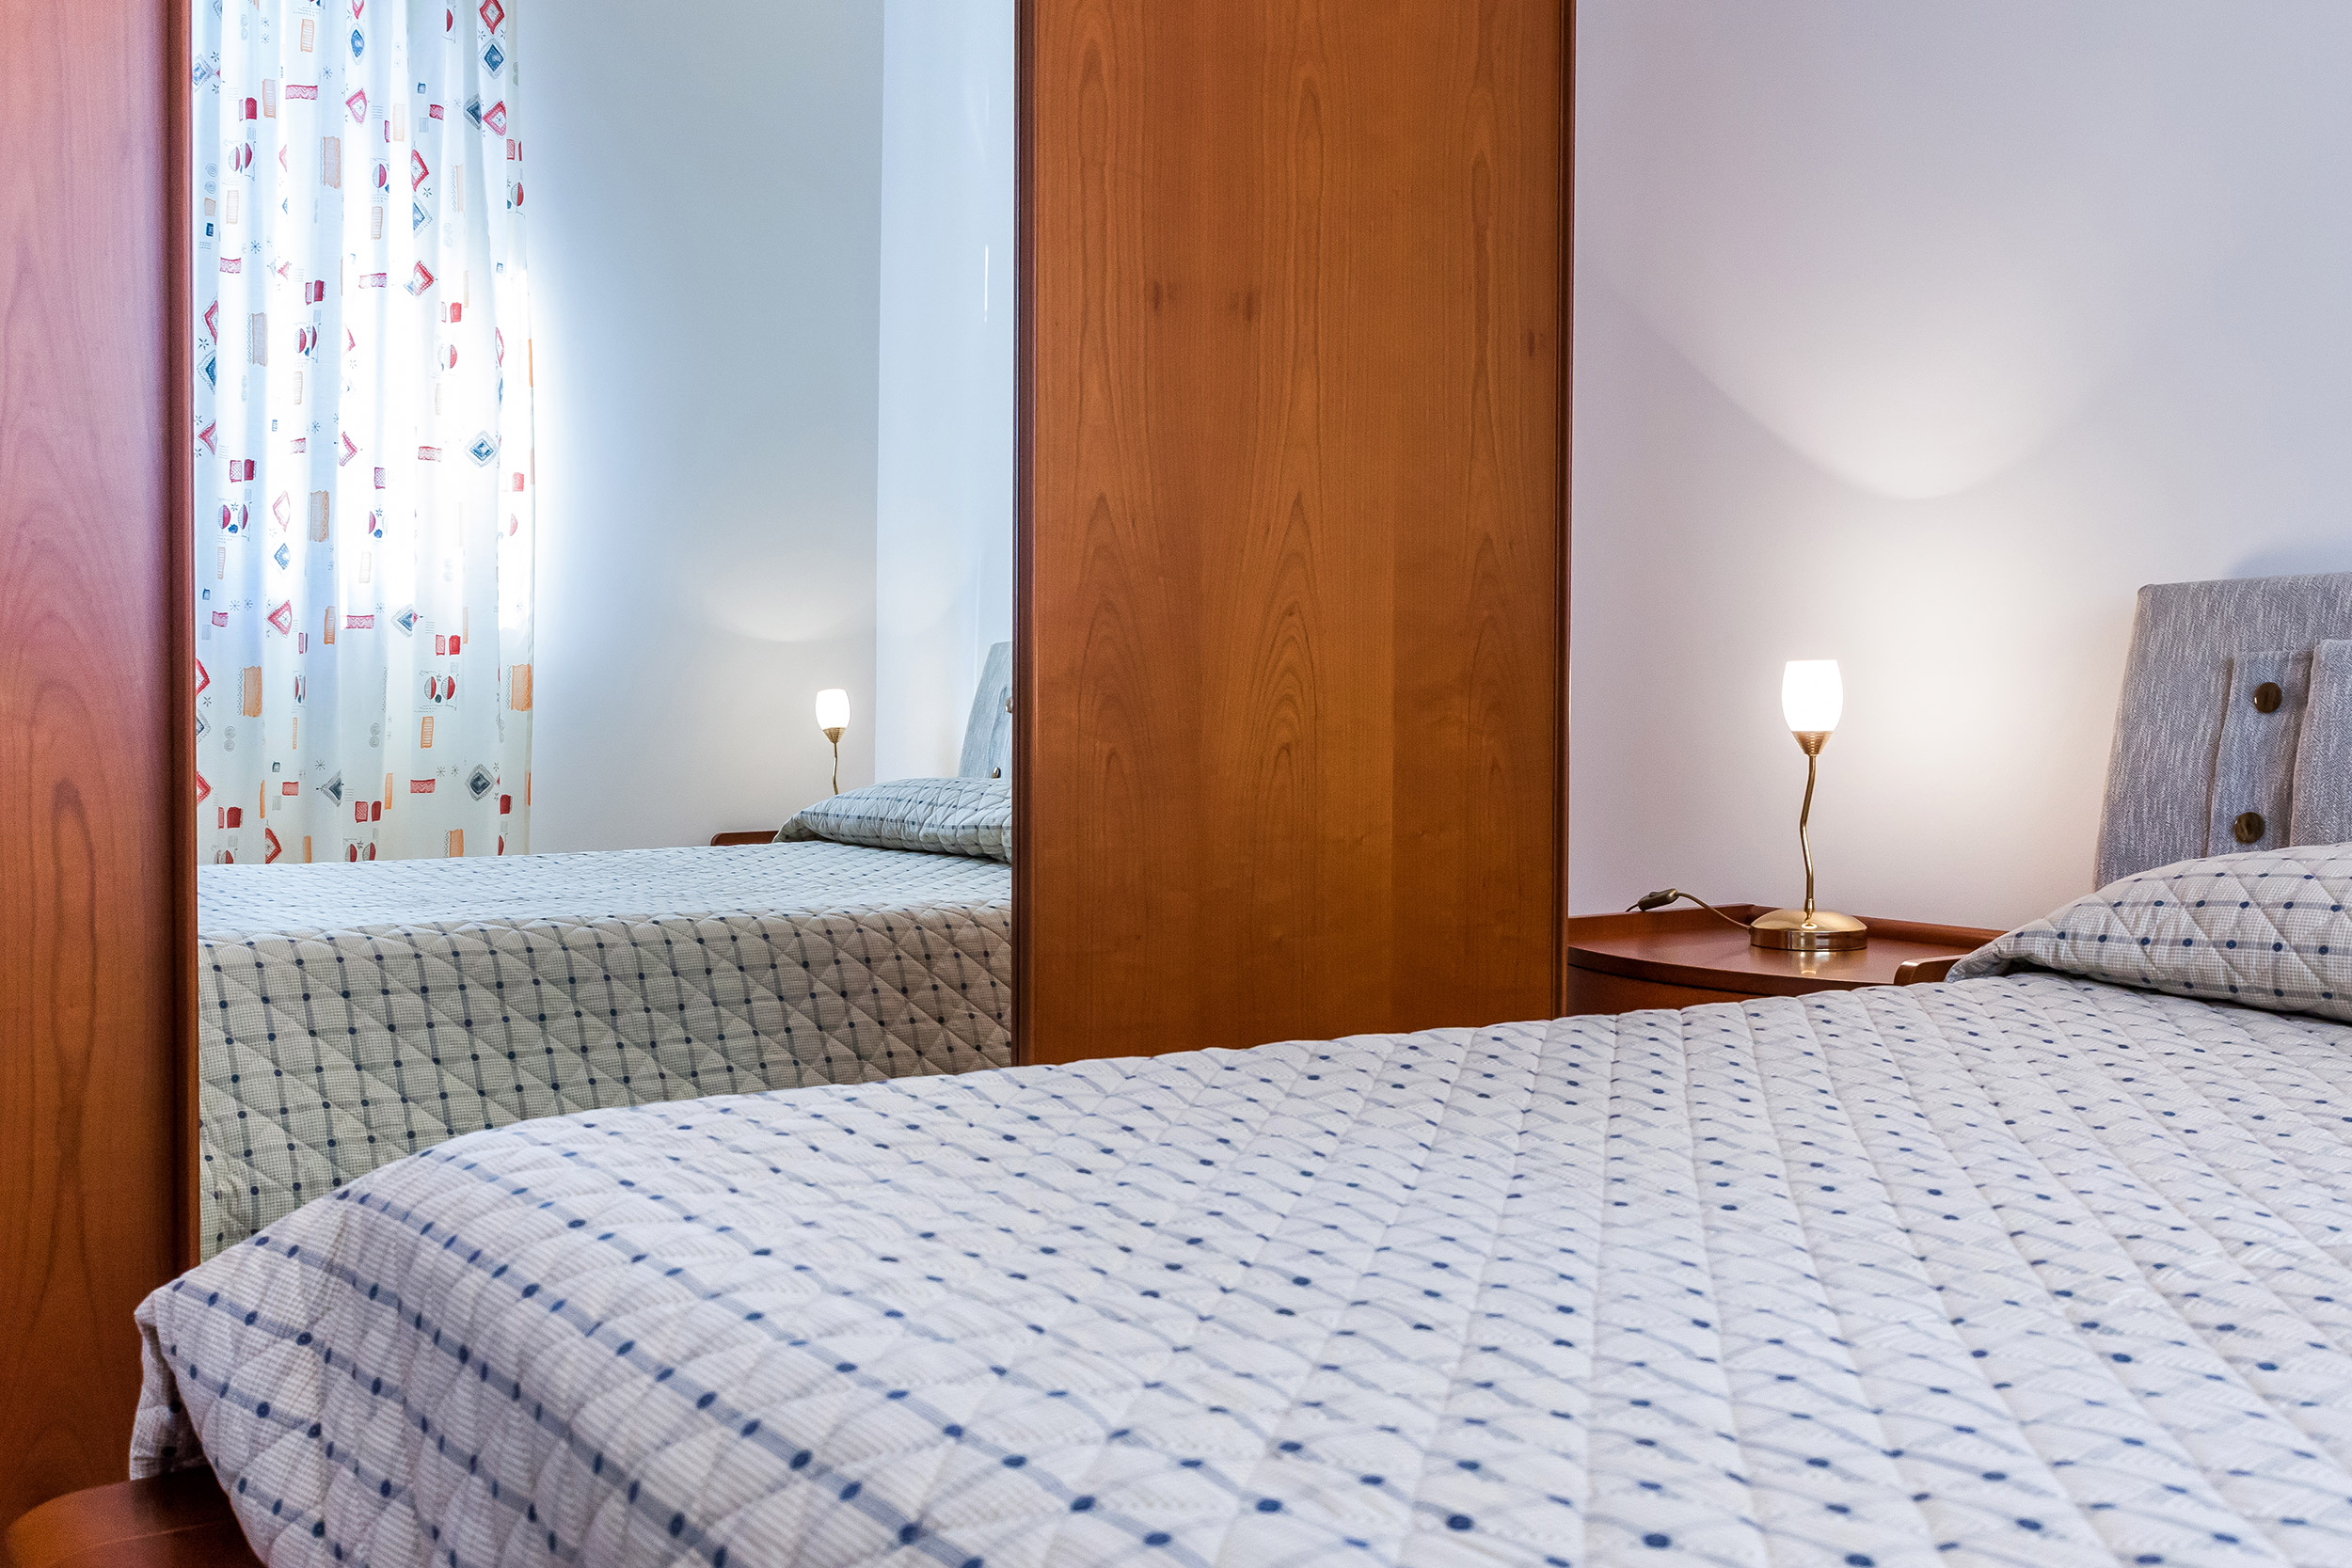 Ferienwohnung Appartamento vista mare a Gallipoli 4/6 posti - Baia Blu Side (2574458), Gallipoli, Lecce, Apulien, Italien, Bild 13